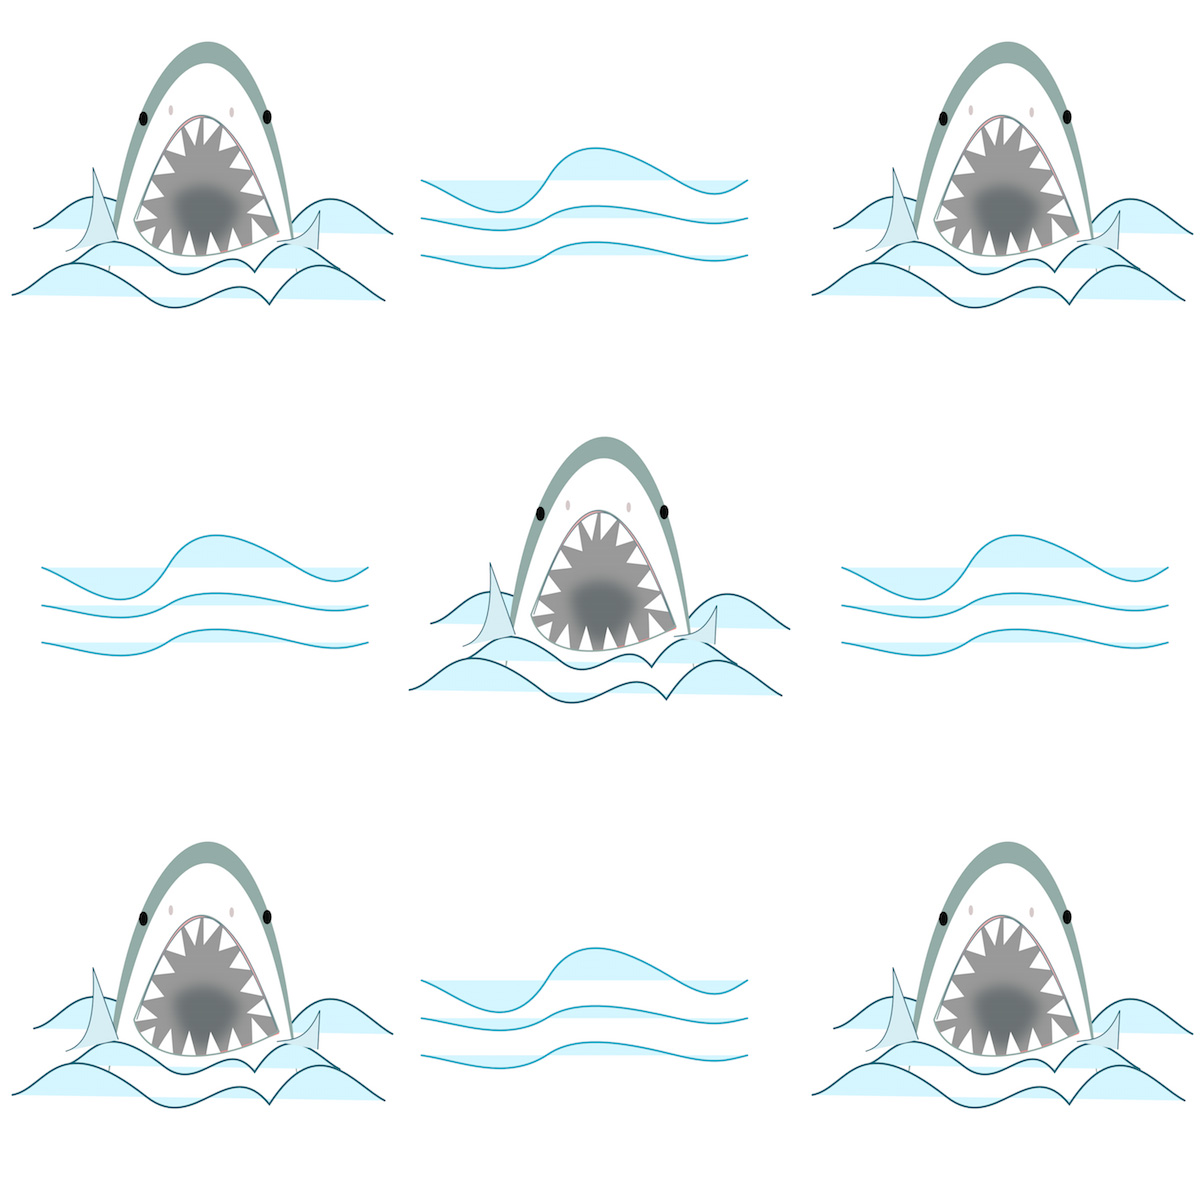 digital shark scrapbooking paper ausdruckbares digital shark scrapbooking paper ausdruckbares geschenkpapier bie